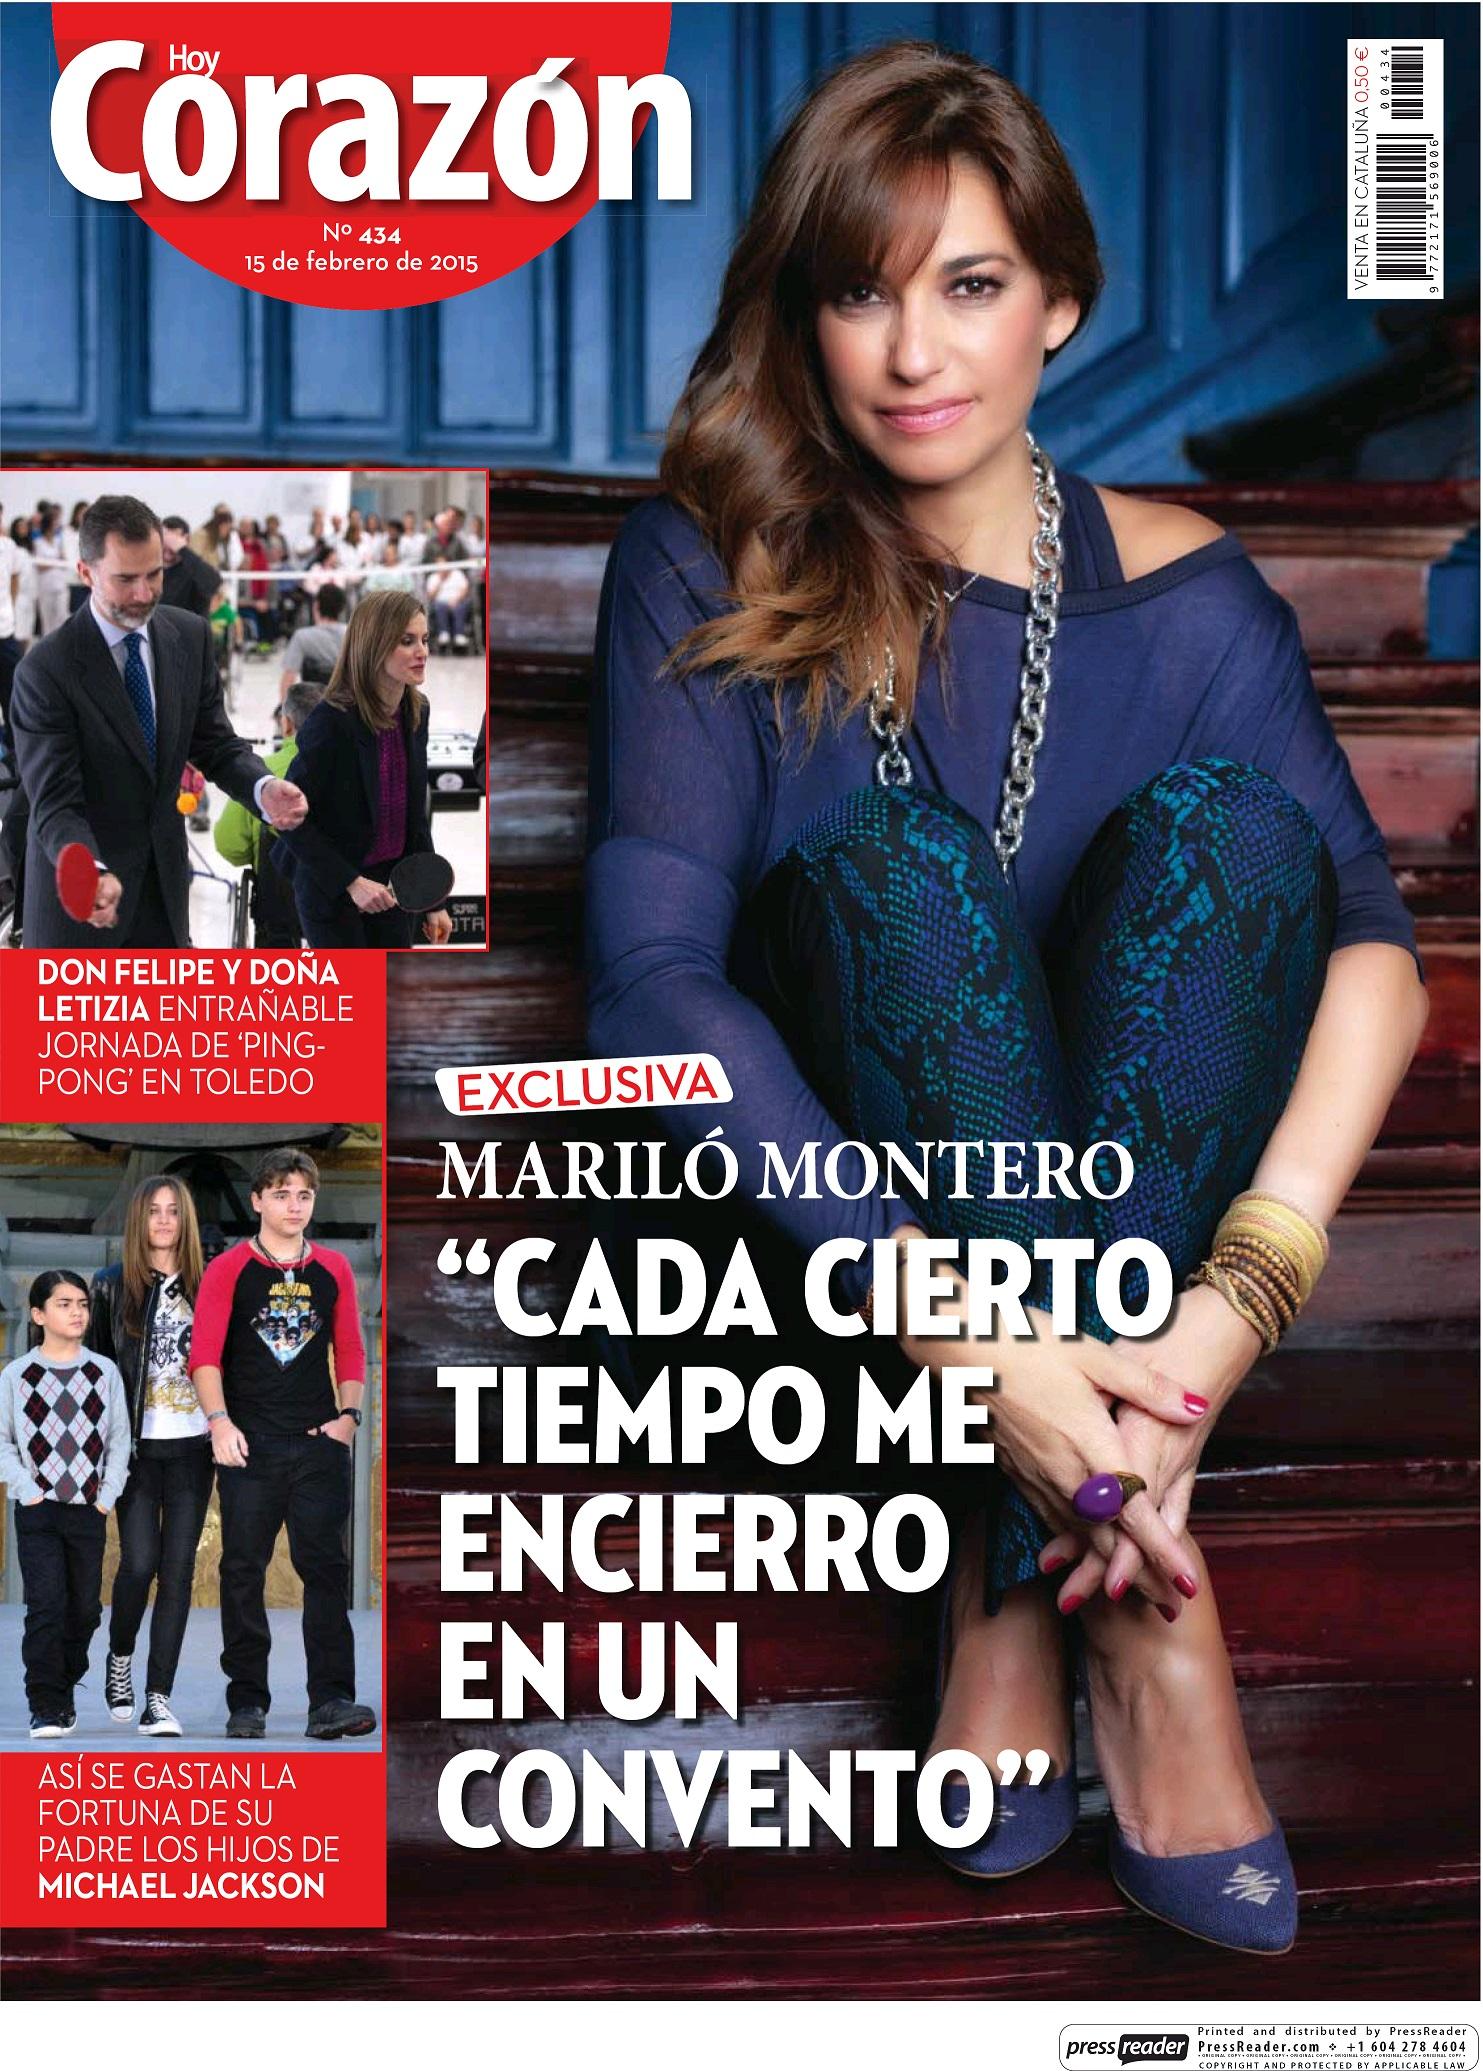 HOY CORAZON portada 15 de Febrero 2015